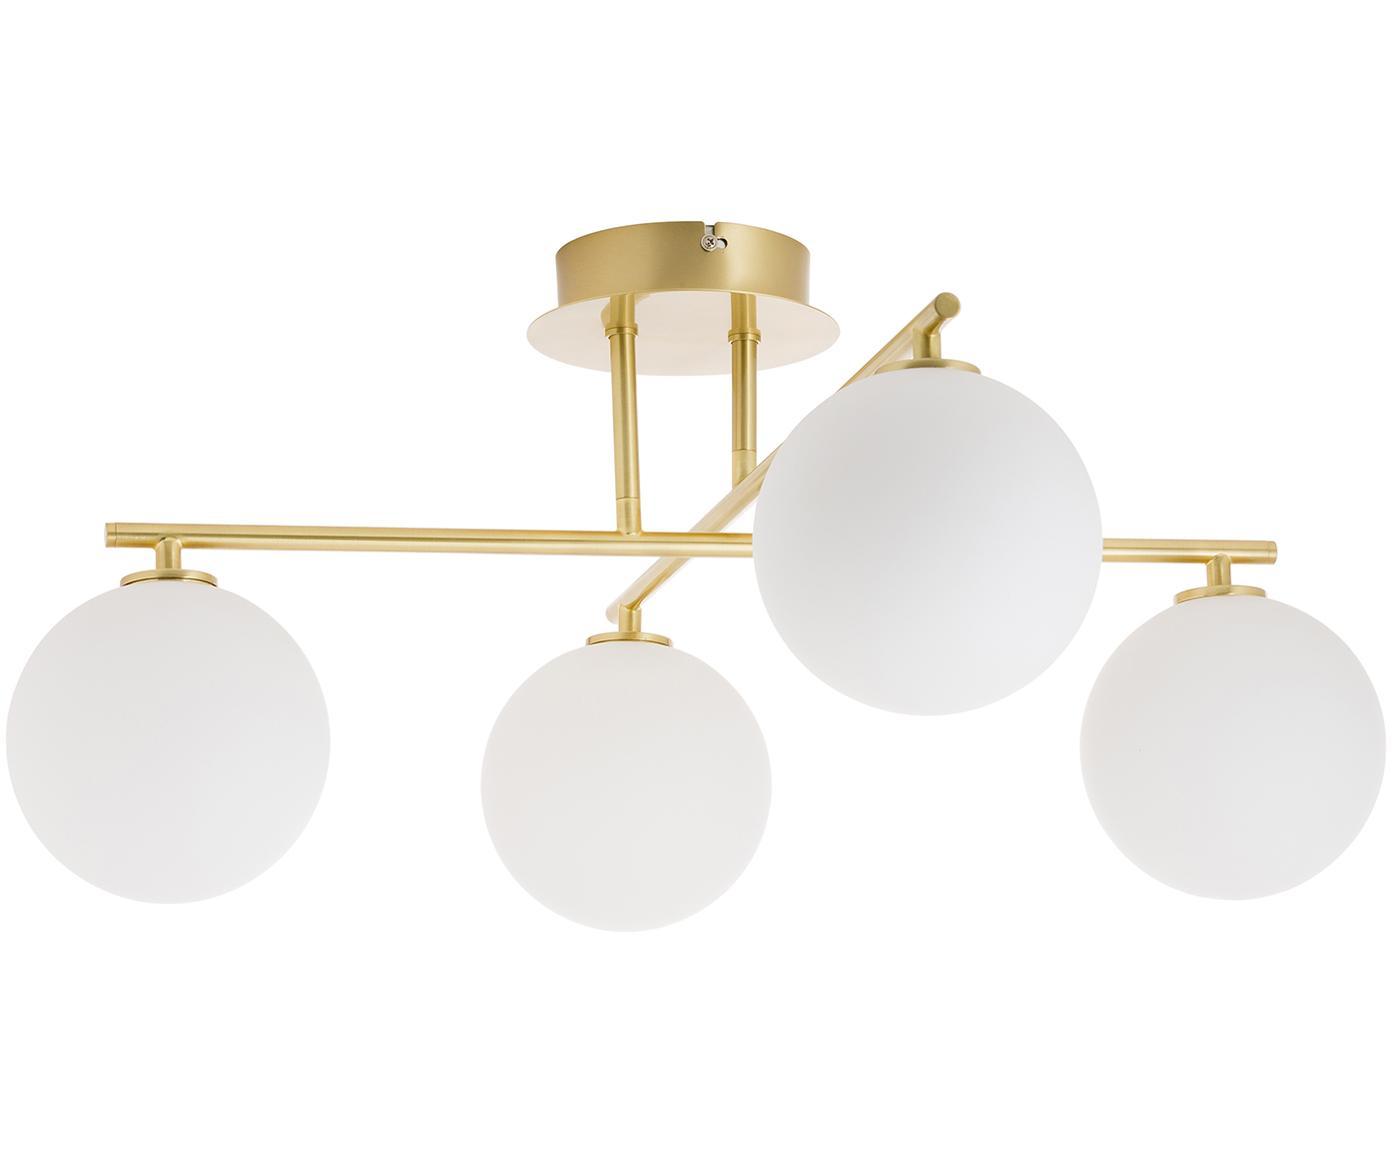 Plafondlamp Atlanta, Wit, messingkleurig, 66 x 30 cm